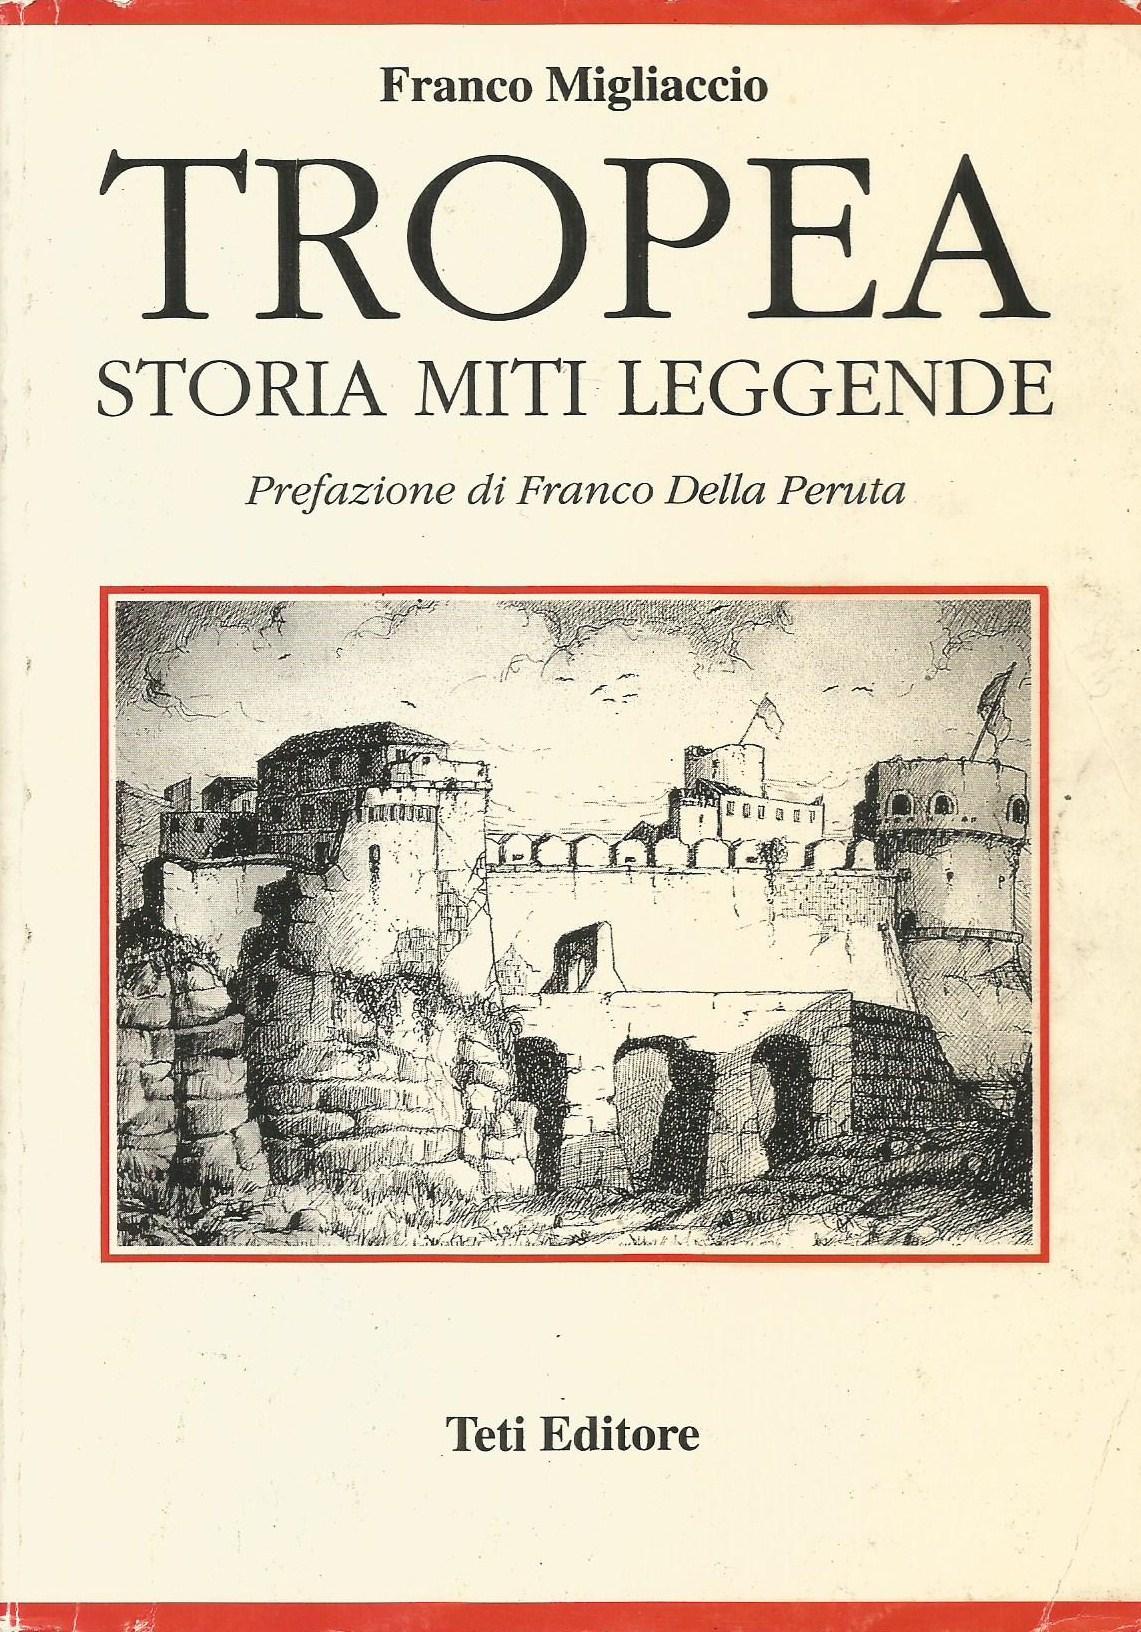 Tropea: storia, miti, leggende